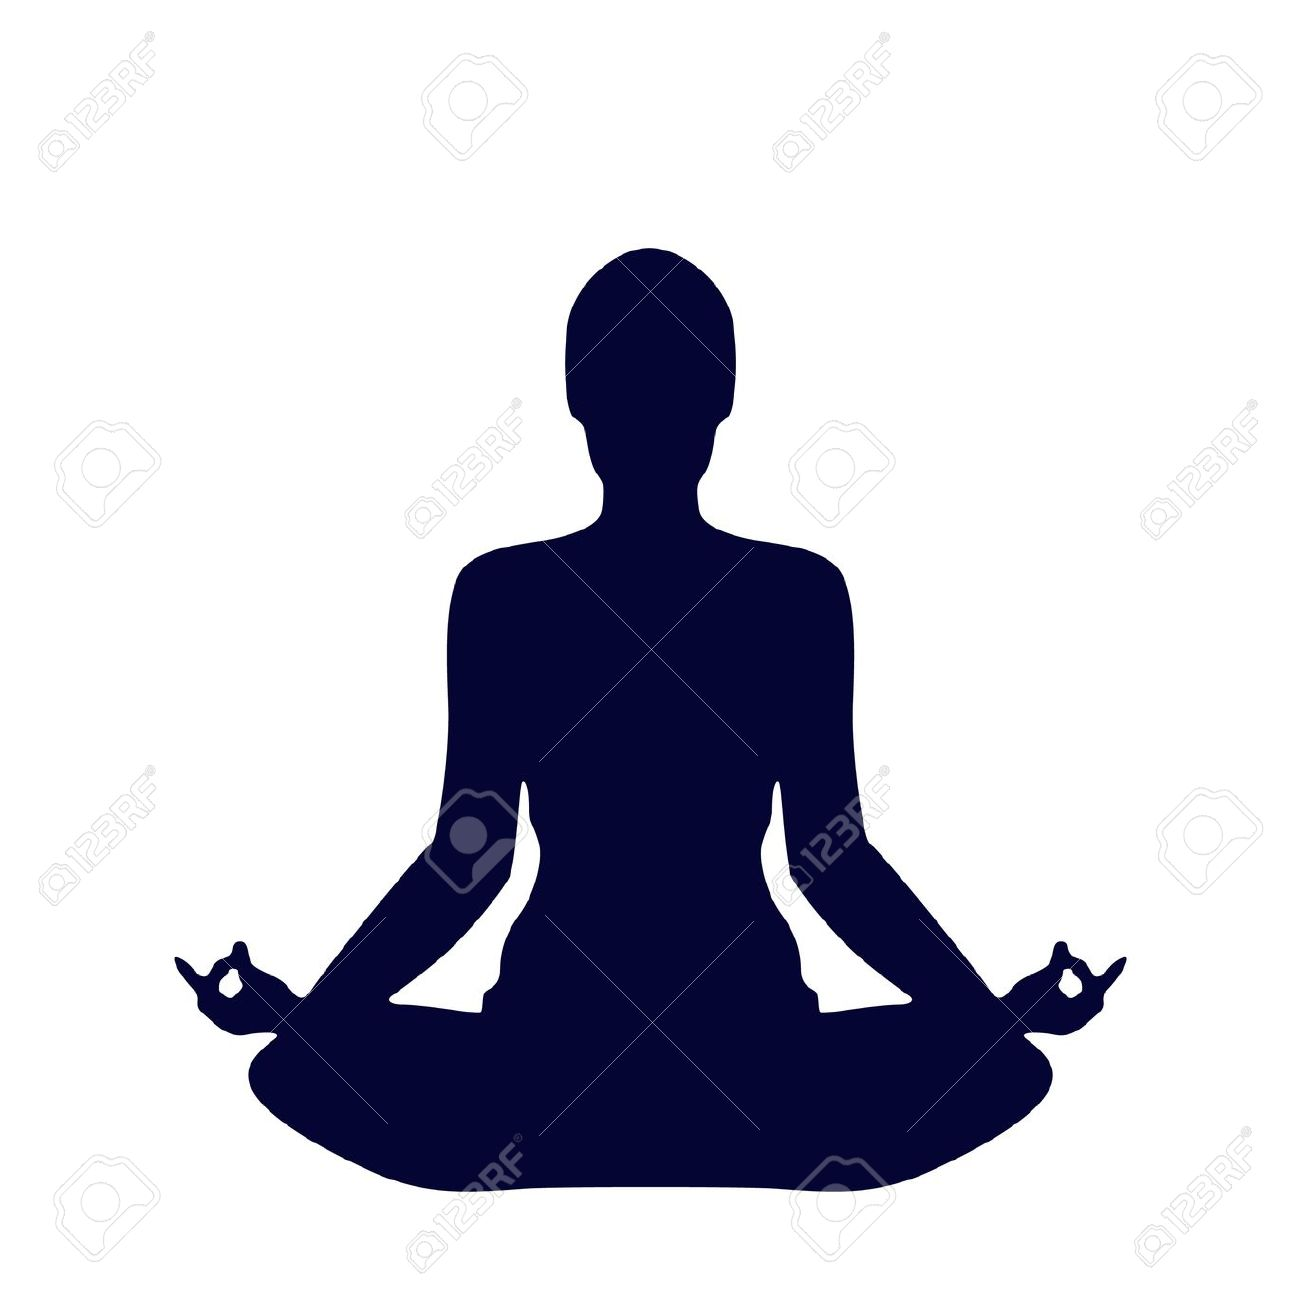 yoga silhouette: Pose Yoga .-yoga silhouette: Pose Yoga .-13